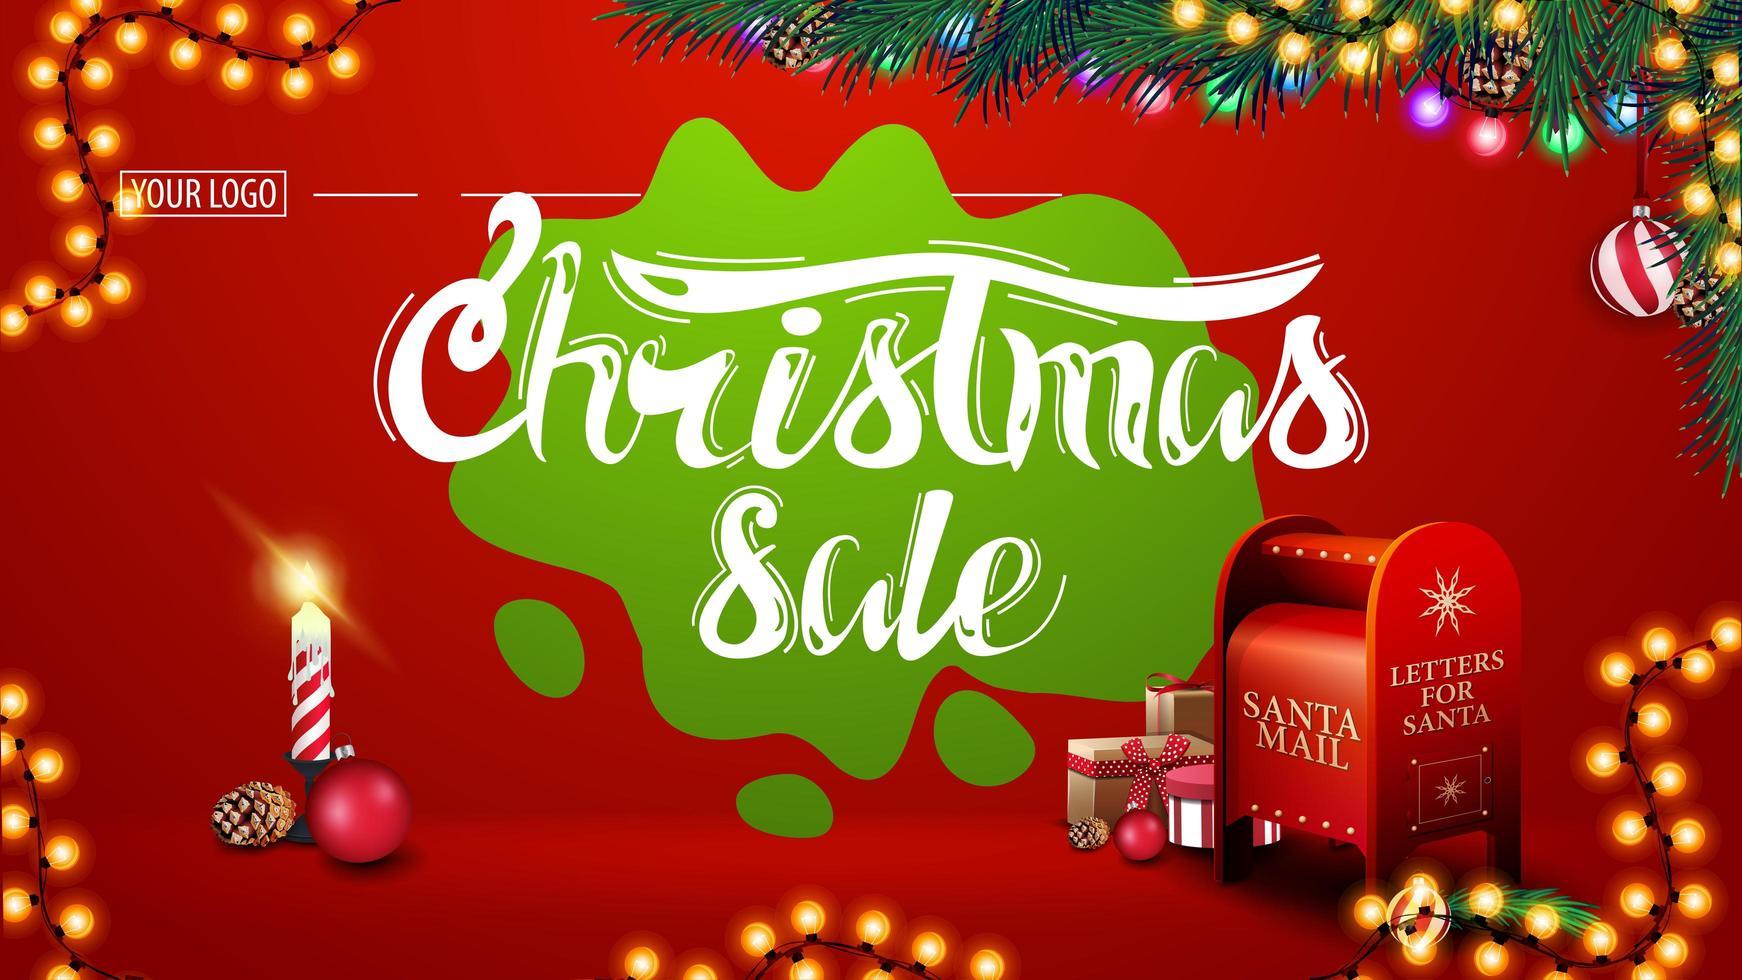 kerstuitverkoop, moderne rode kortingsbanner met prachtige letters, slingers, groene vlek, kerstboomtakken, kaars en kerstman brievenbus met cadeautjes vector